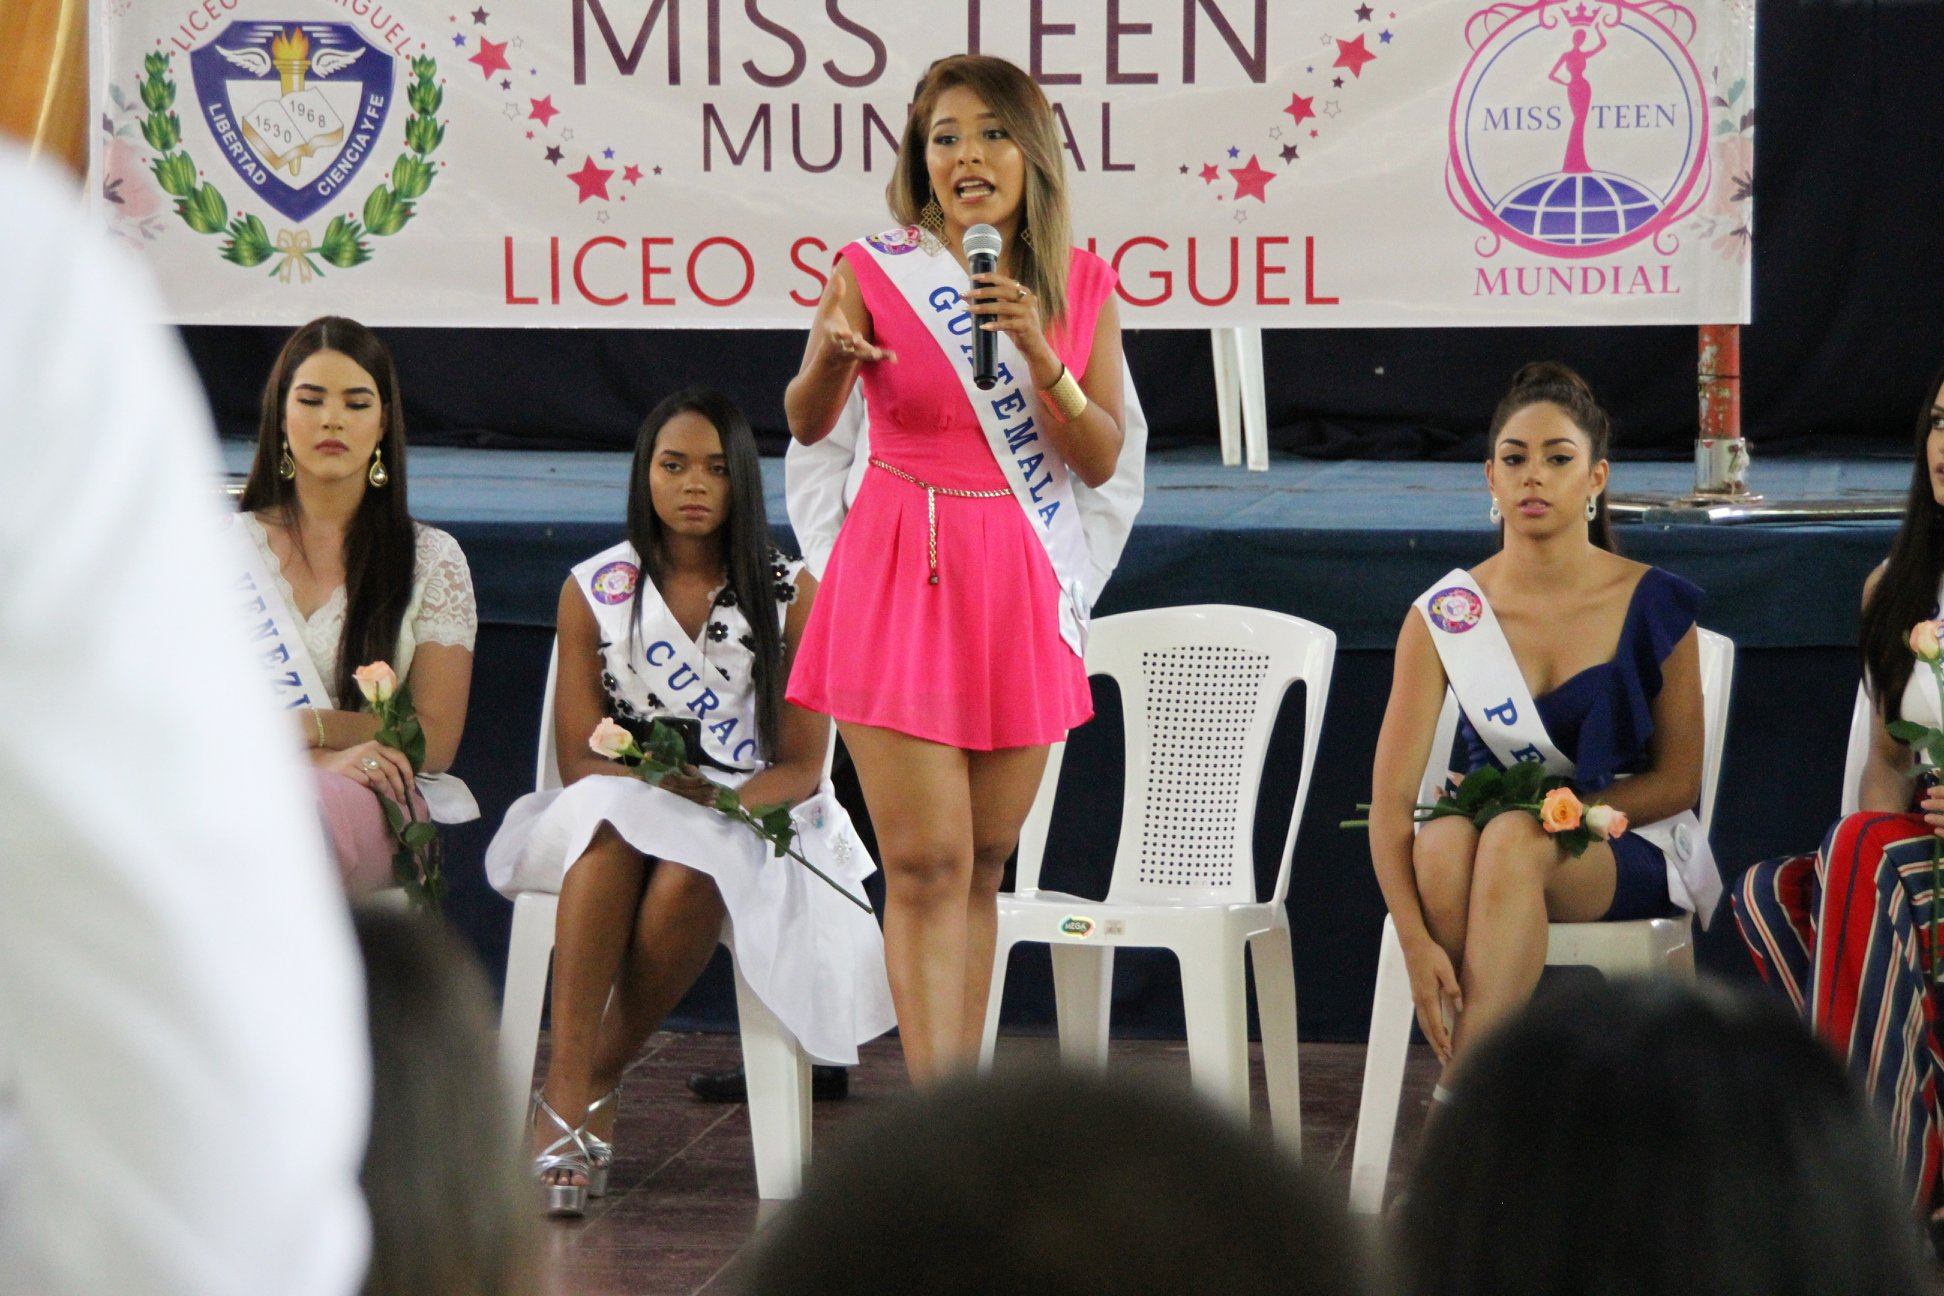 romina lopez, top 12 de miss teen mundial 2019. - Página 4 60770210